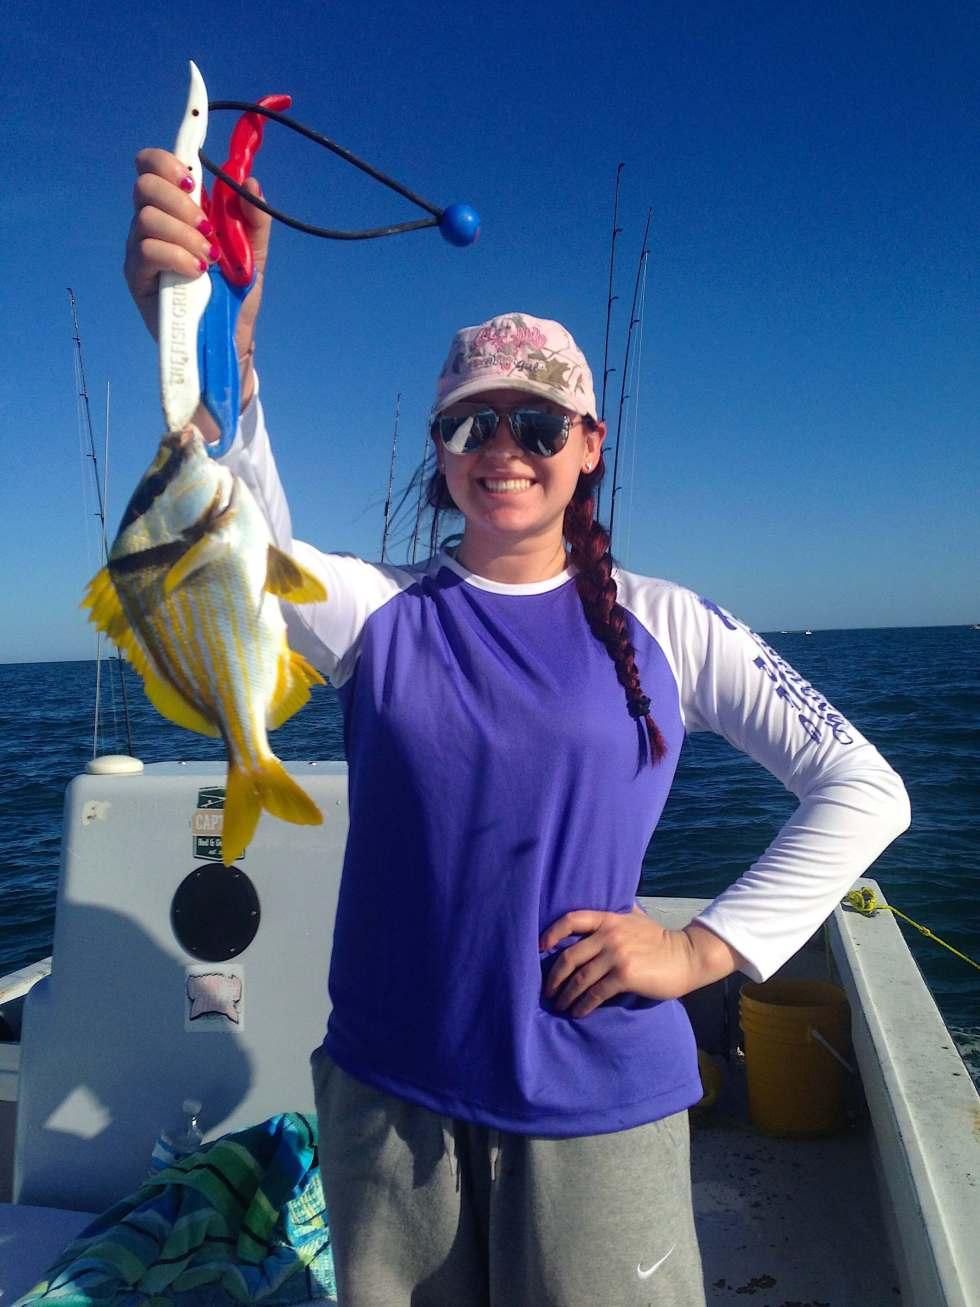 Porkfish, Offshore, Sanibel Fishing & Captiva Fishing, Sanibel Island, Sunday, November 27, 2016.